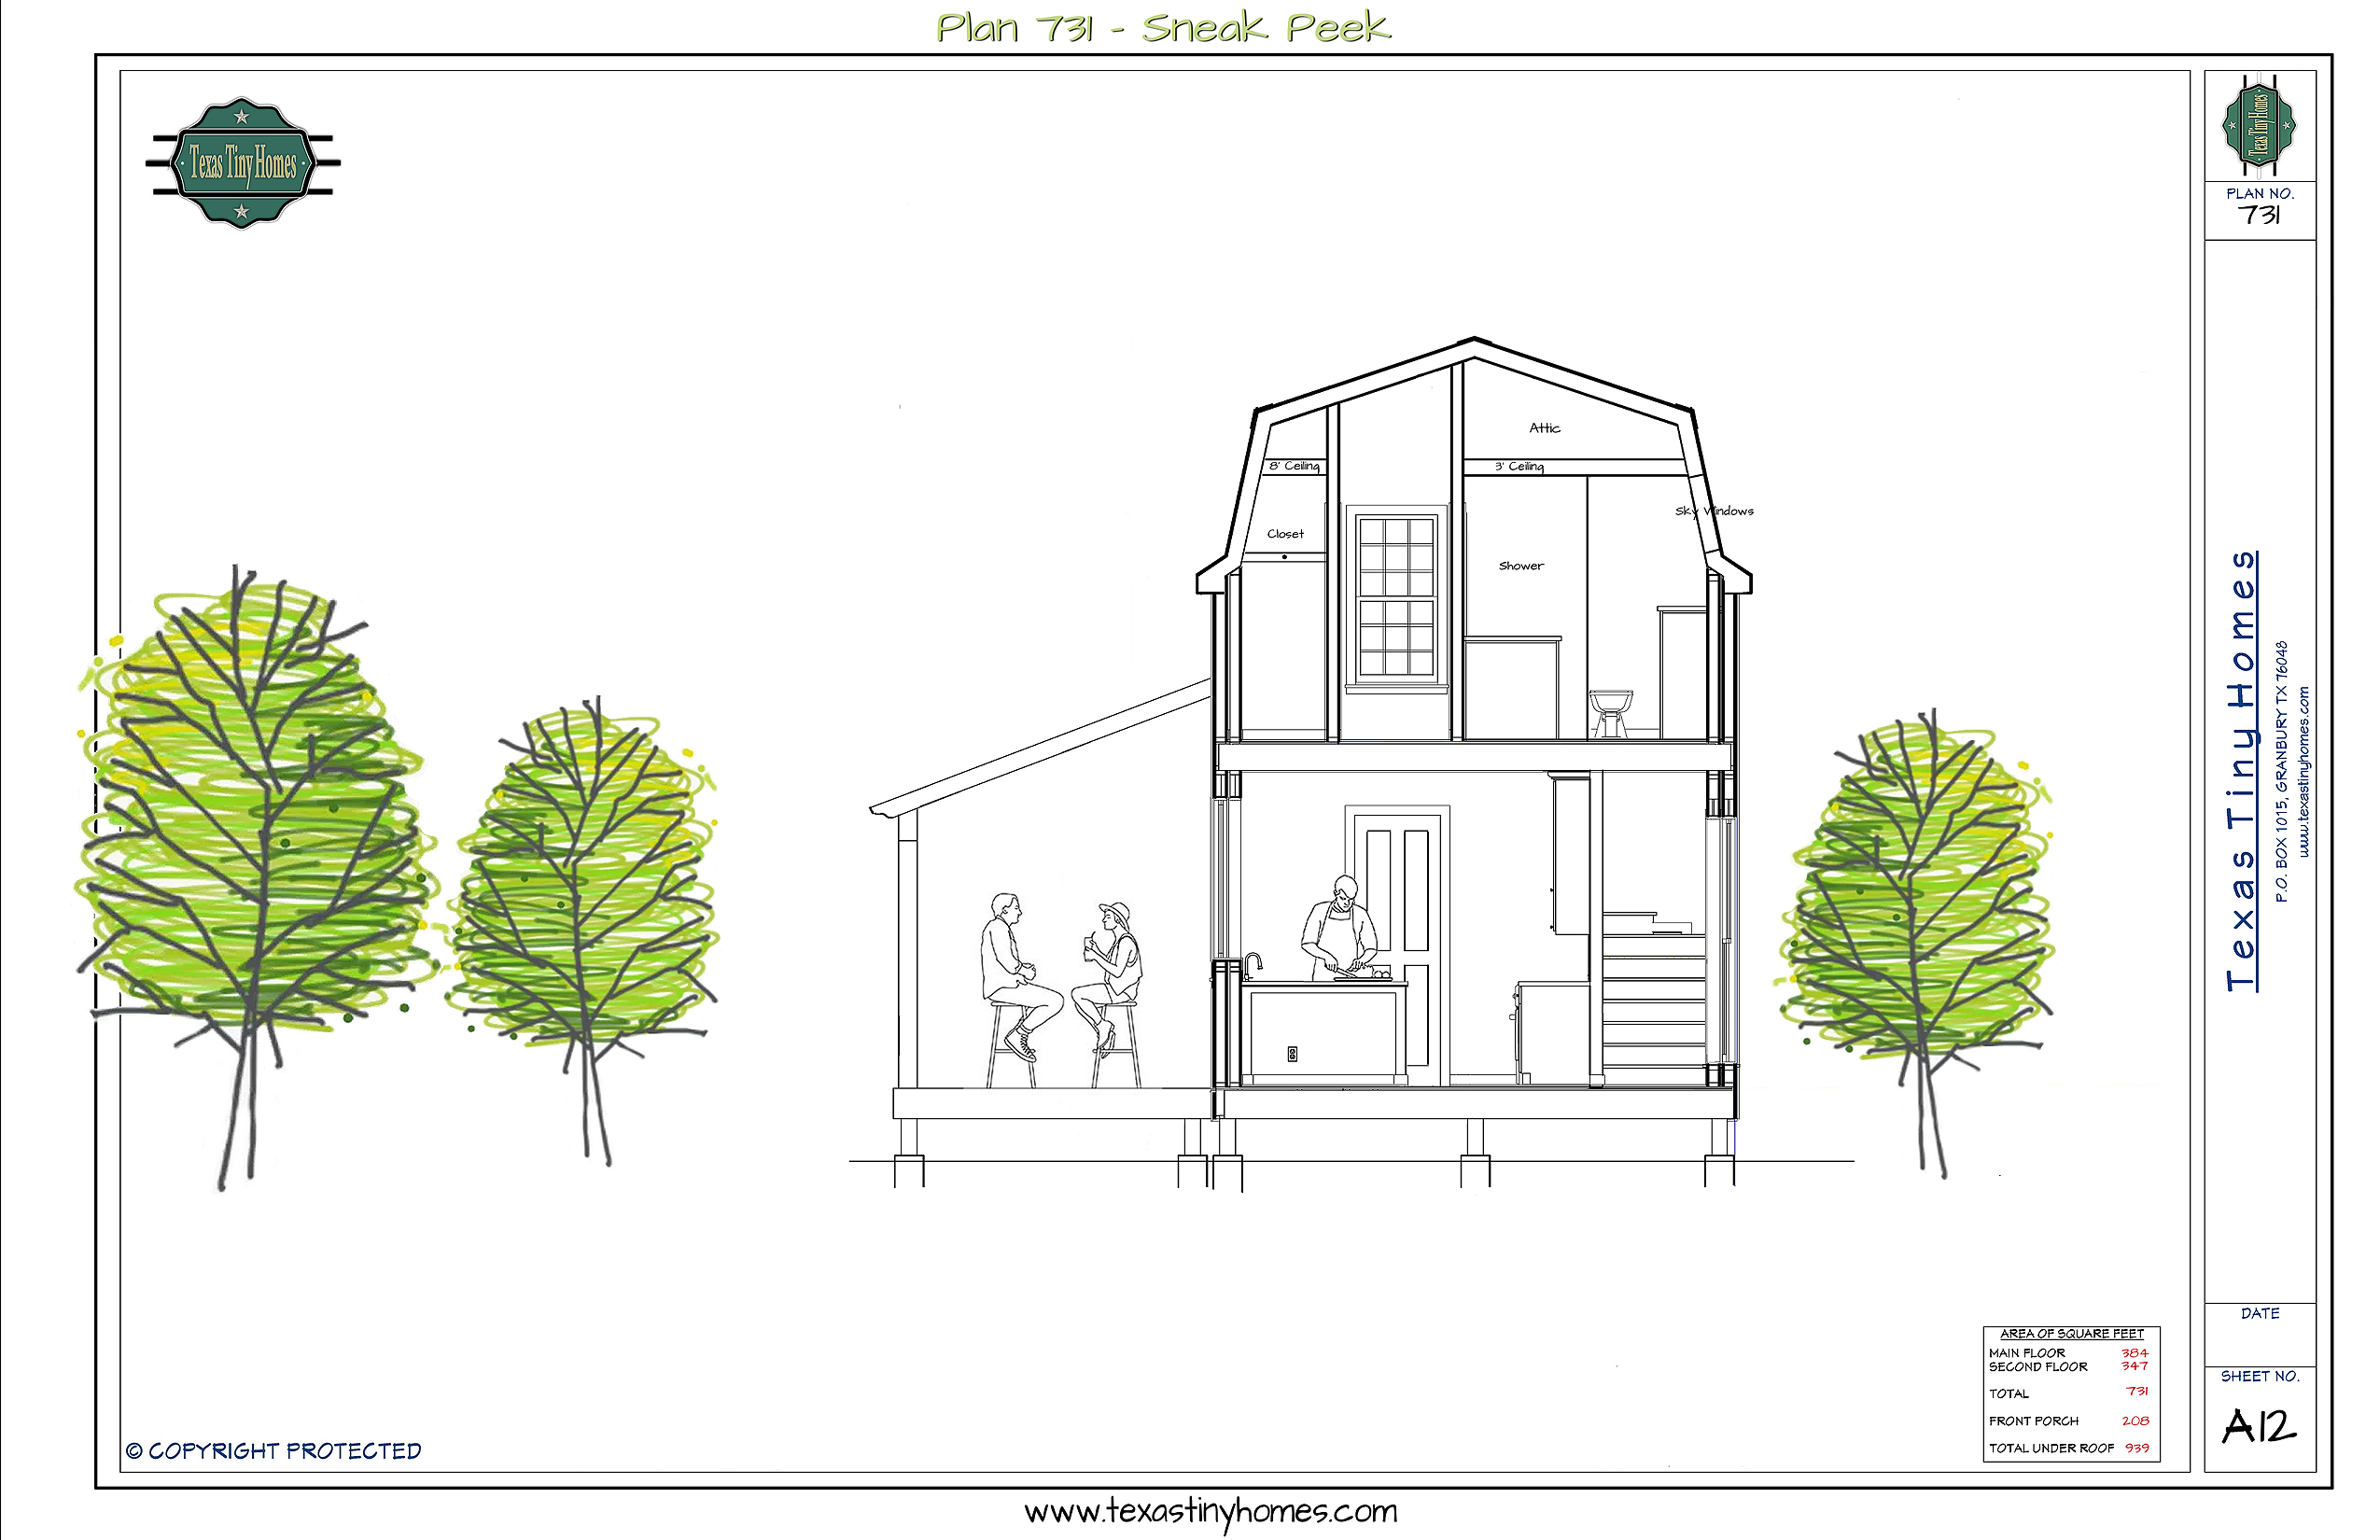 Plan 731 sneak peek for Super energy efficient home plans